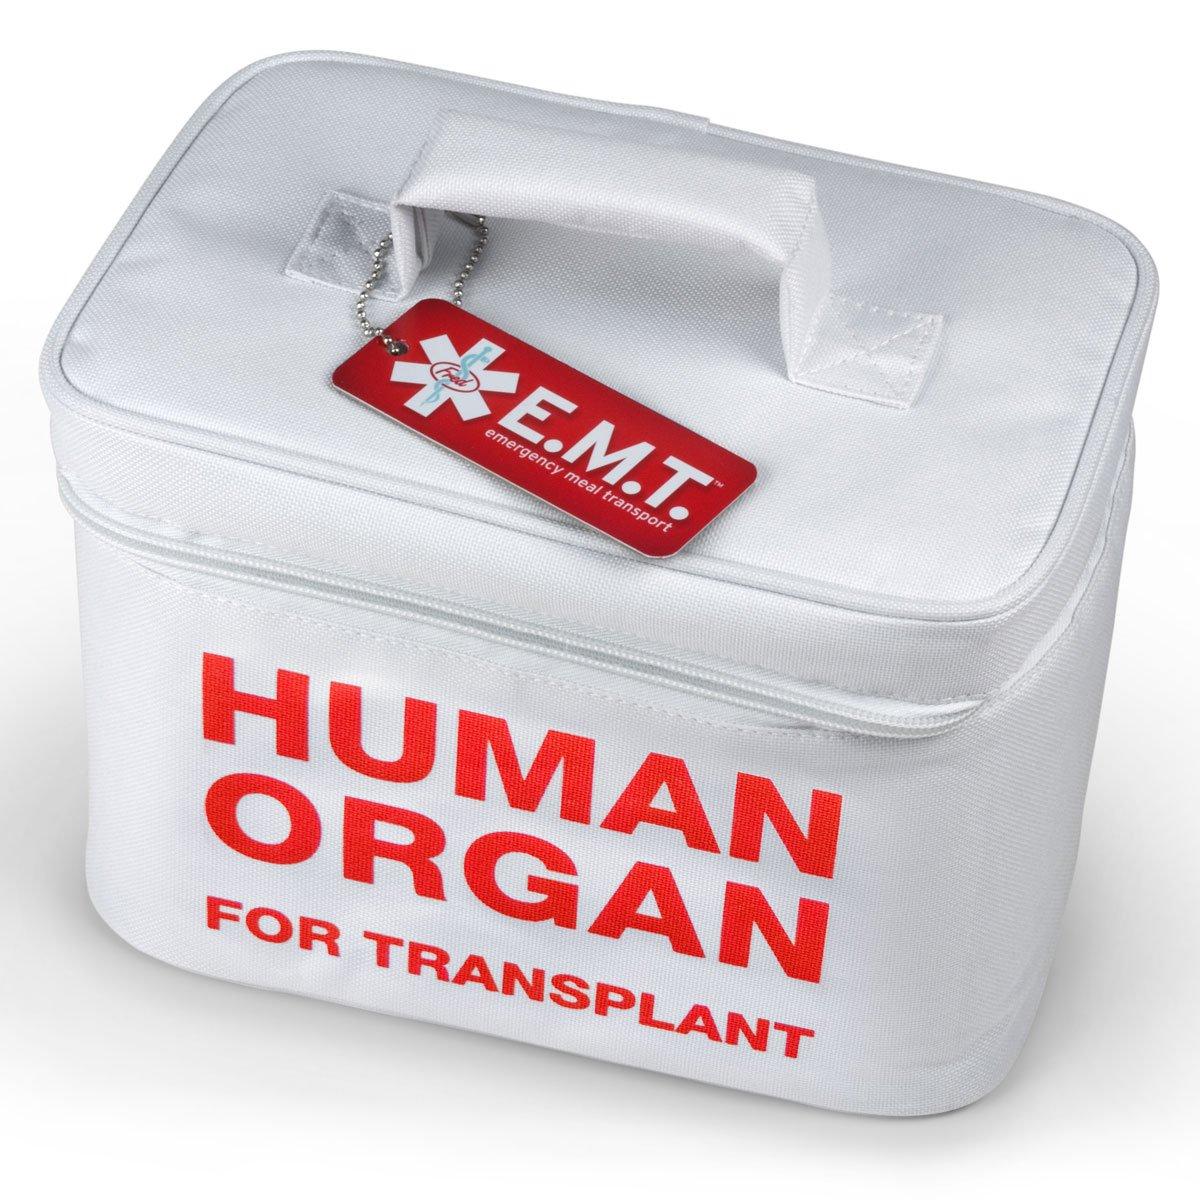 Multi Organ Transplant in India, Low Cost Organ Transplantation in ...